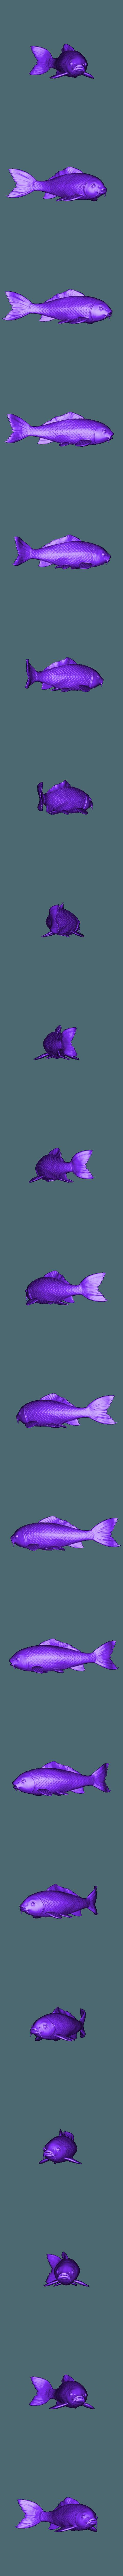 Carp_2.stl Download OBJ file Carp Fancy • Object to 3D print, Dynastinae